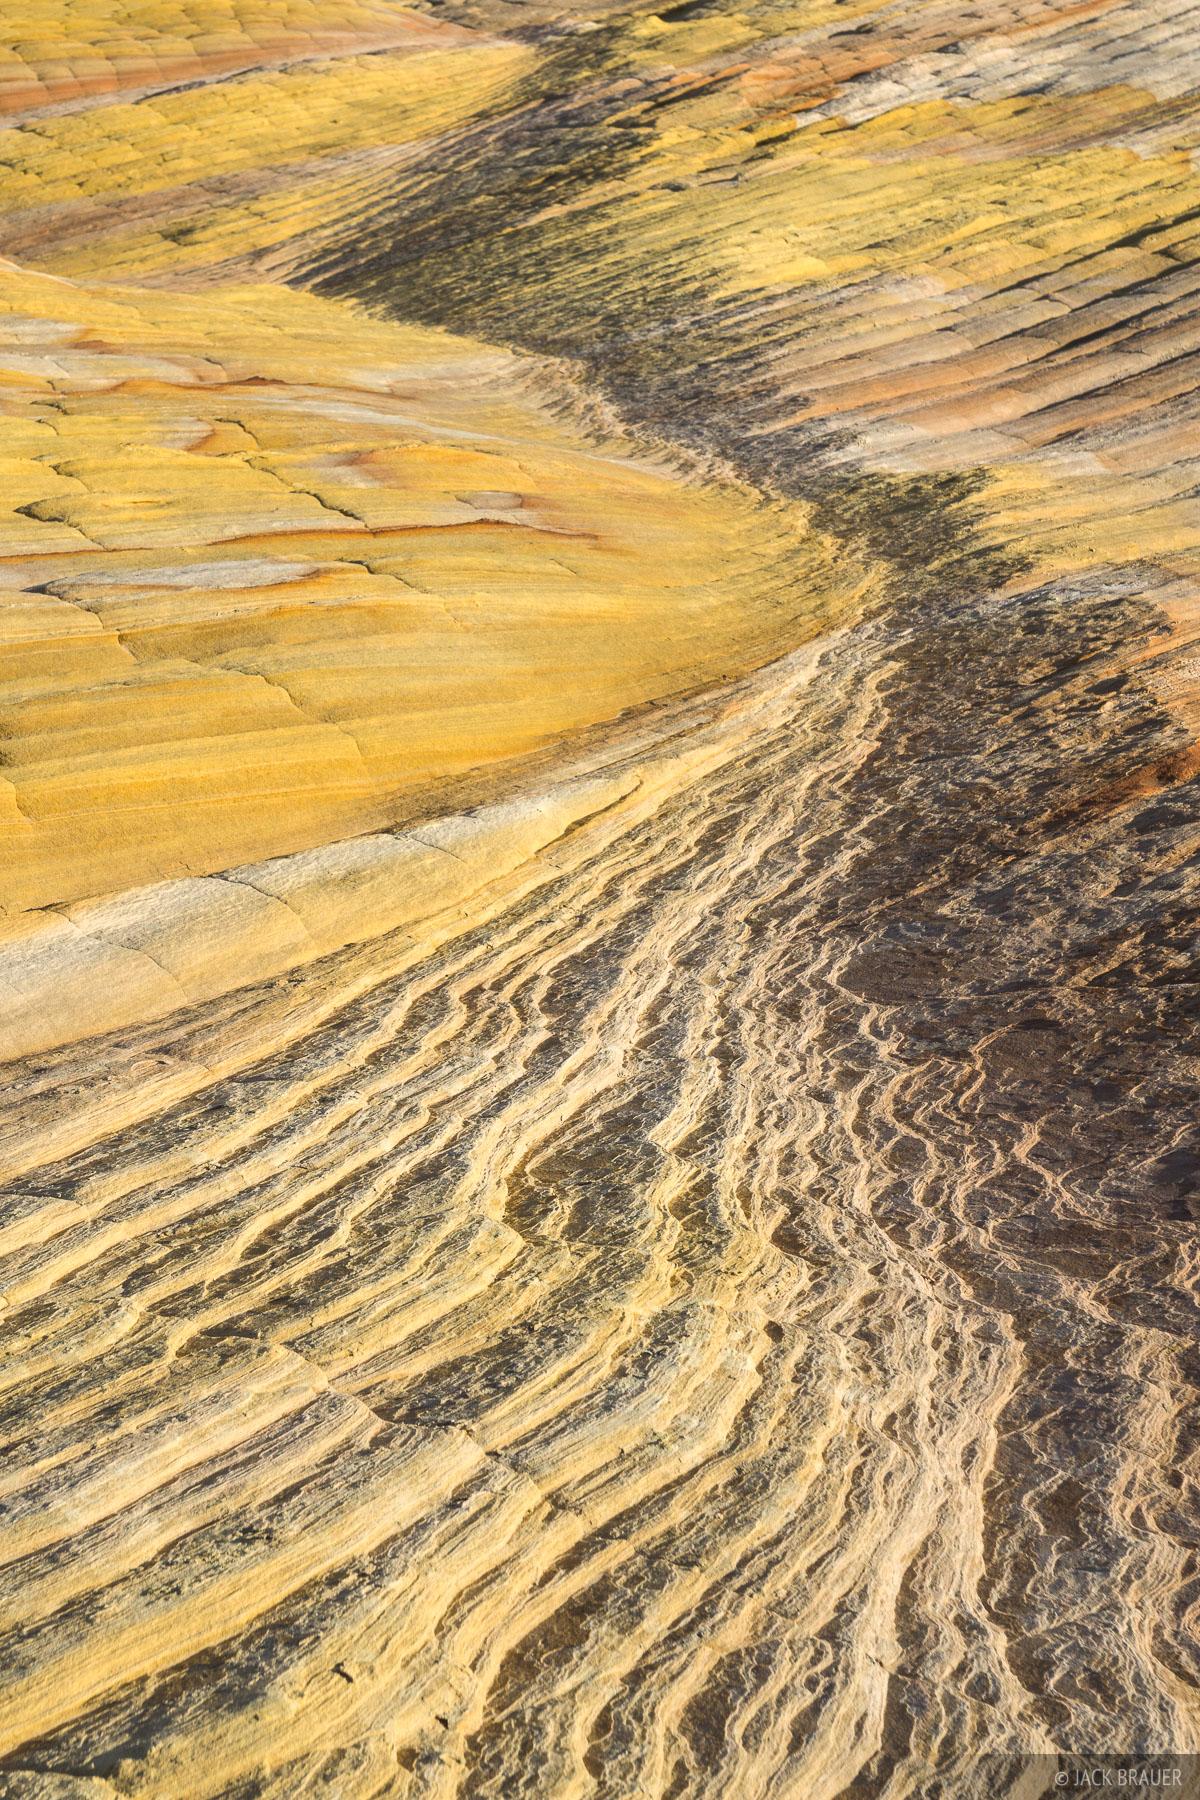 Sandstone patterns on Yellow Rock.